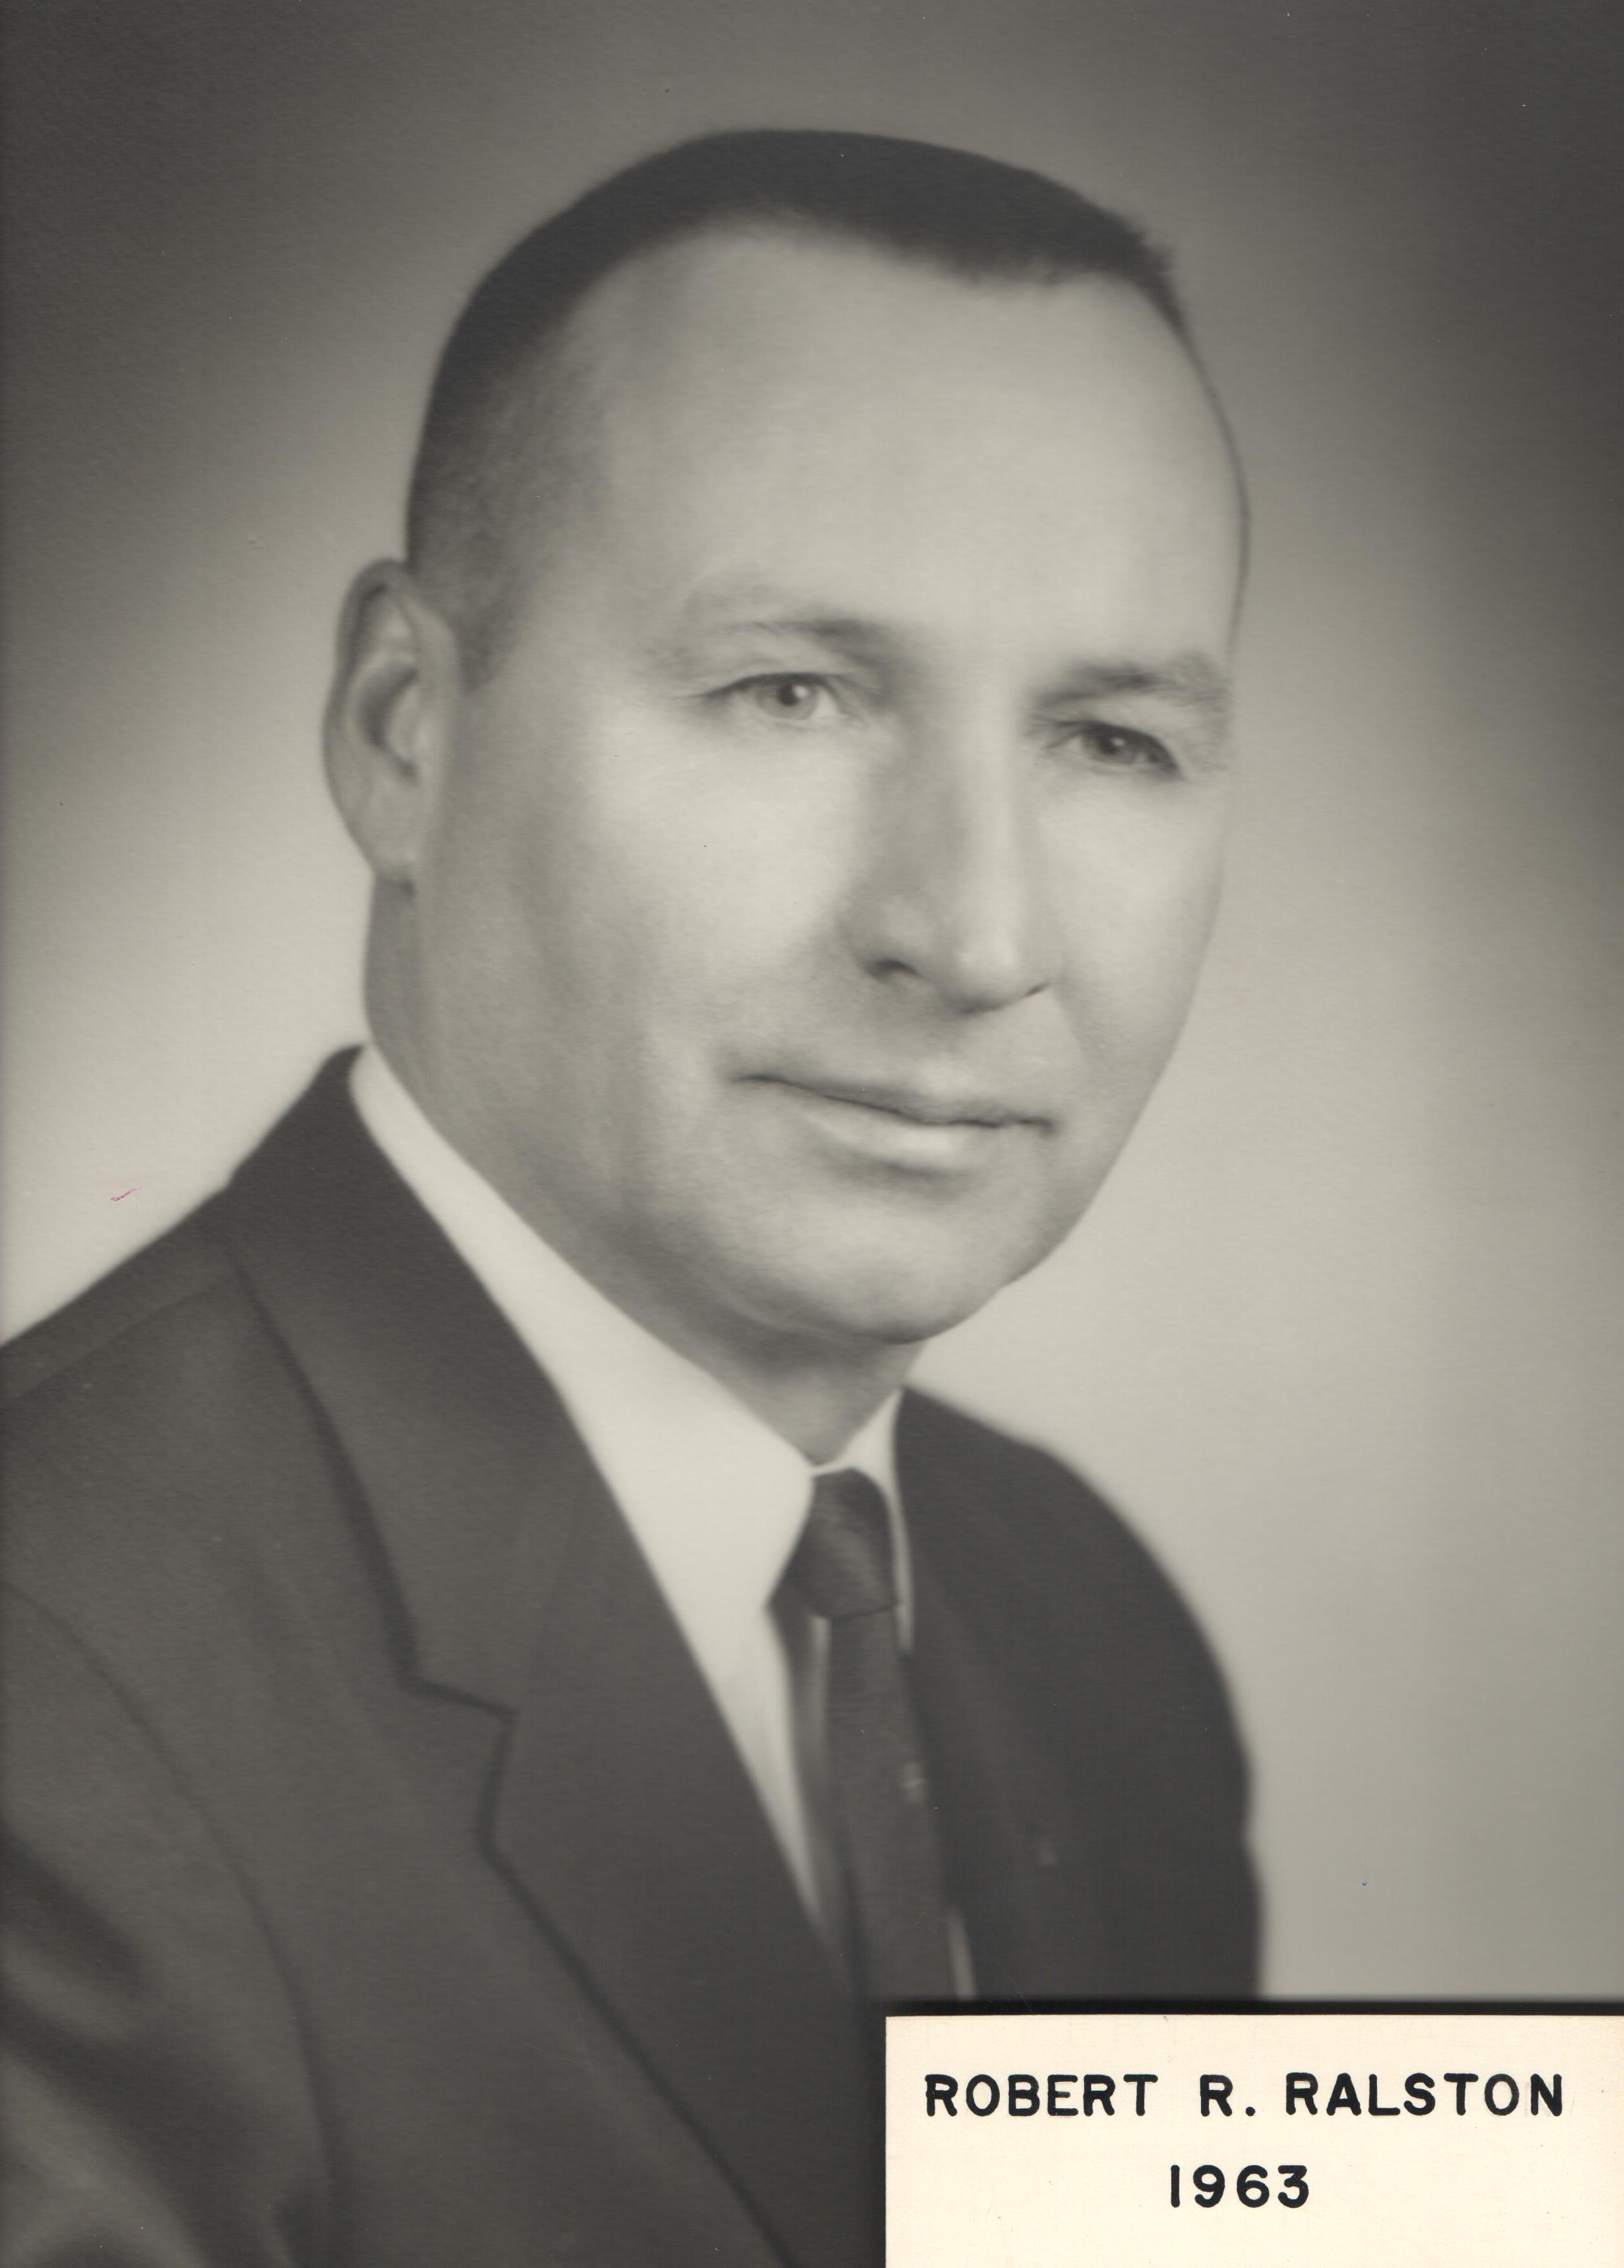 1963 Robert R. Ralston